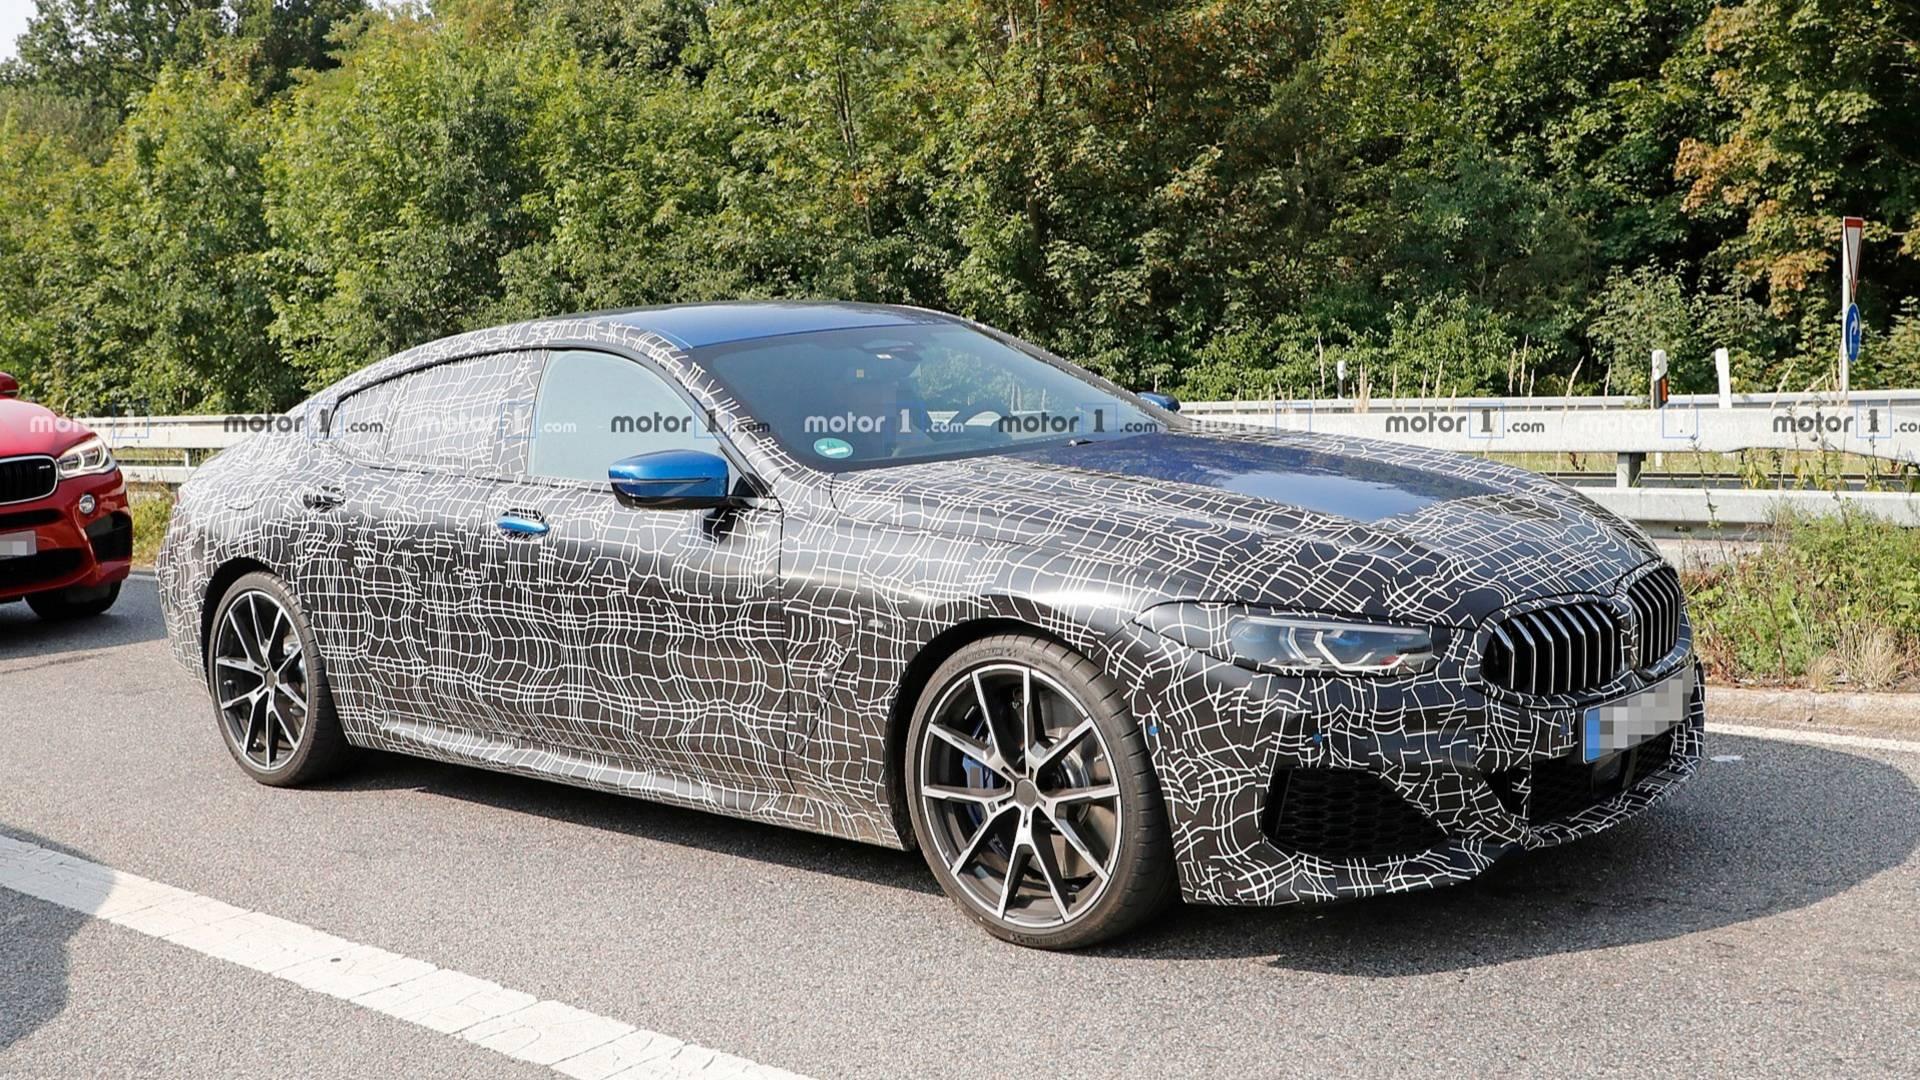 2019 - [BMW] Série 8 Gran Coupé [G16] Bmw-8-series-gran-coupe-spy-photo